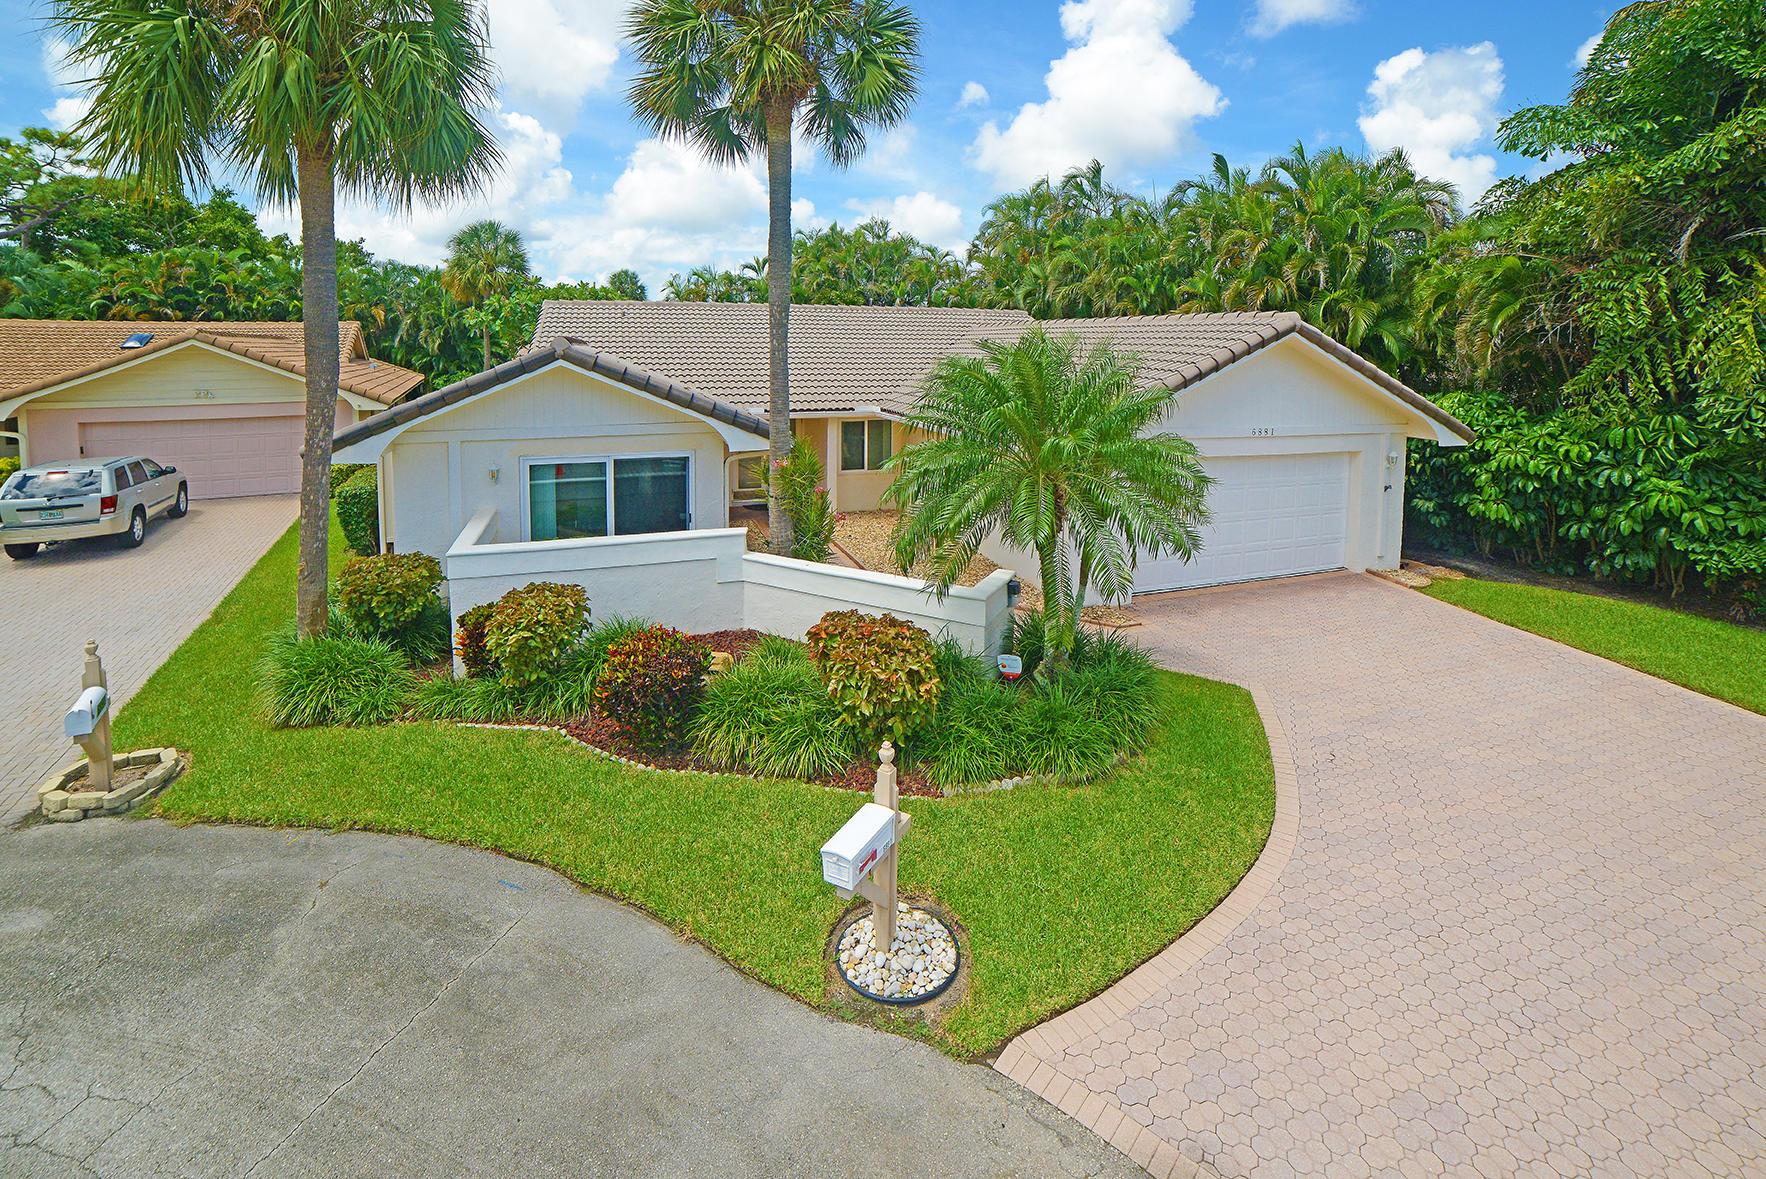 6881 Villas Drive Boca Raton, FL 33433